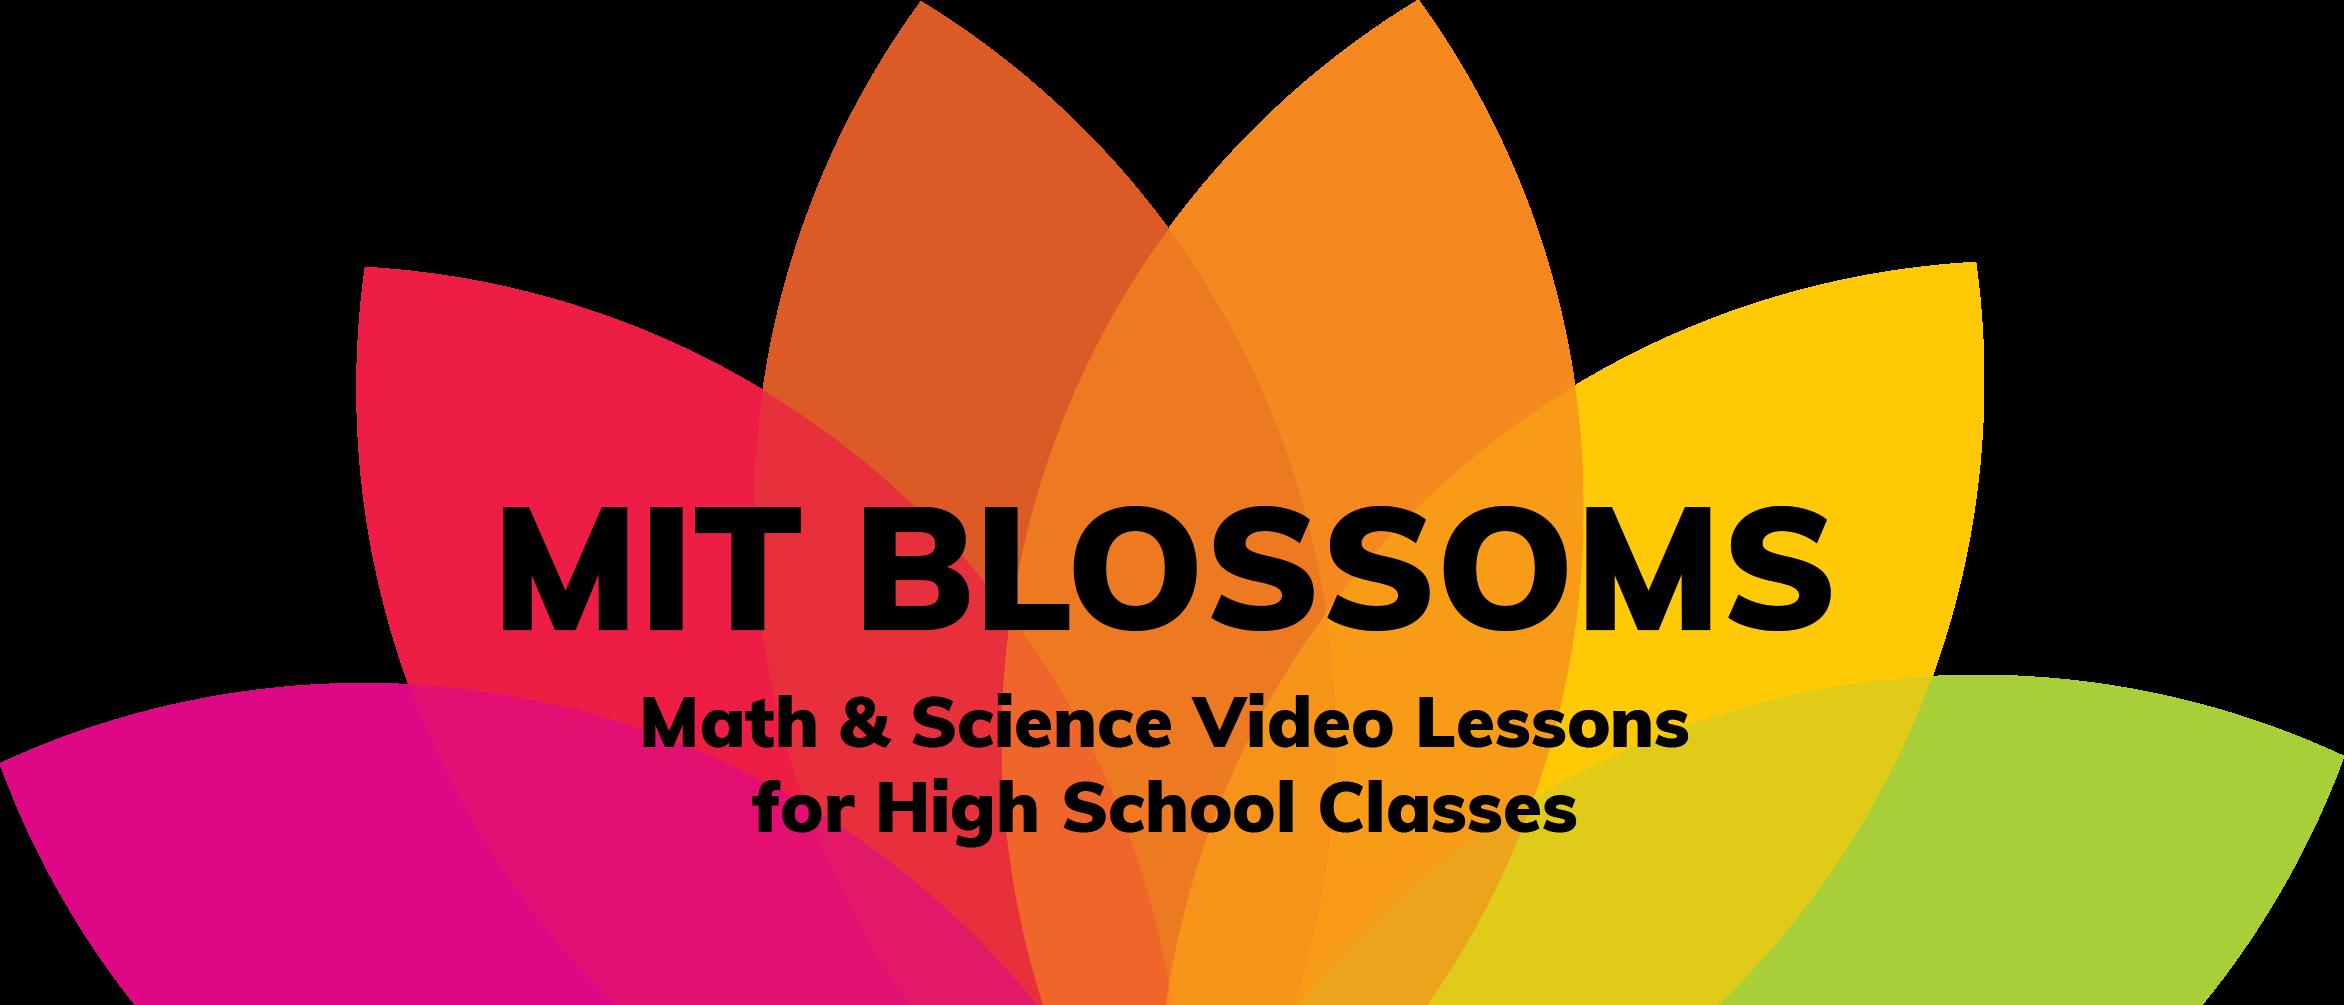 MIT BLOSSOMS